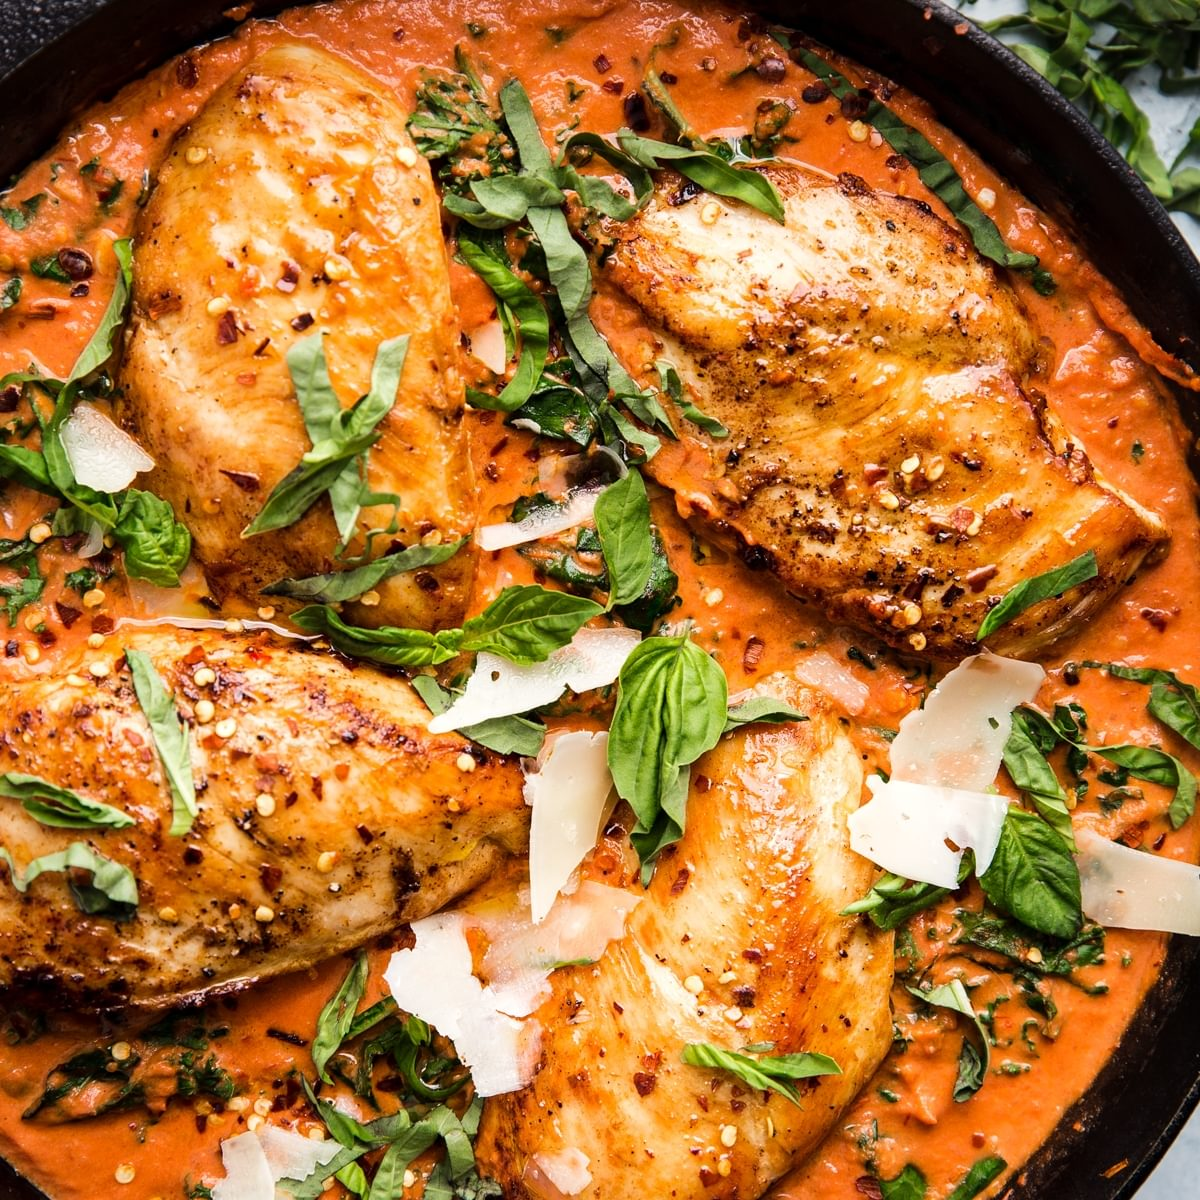 60 Best Chicken Breast Recipes The Modern Proper